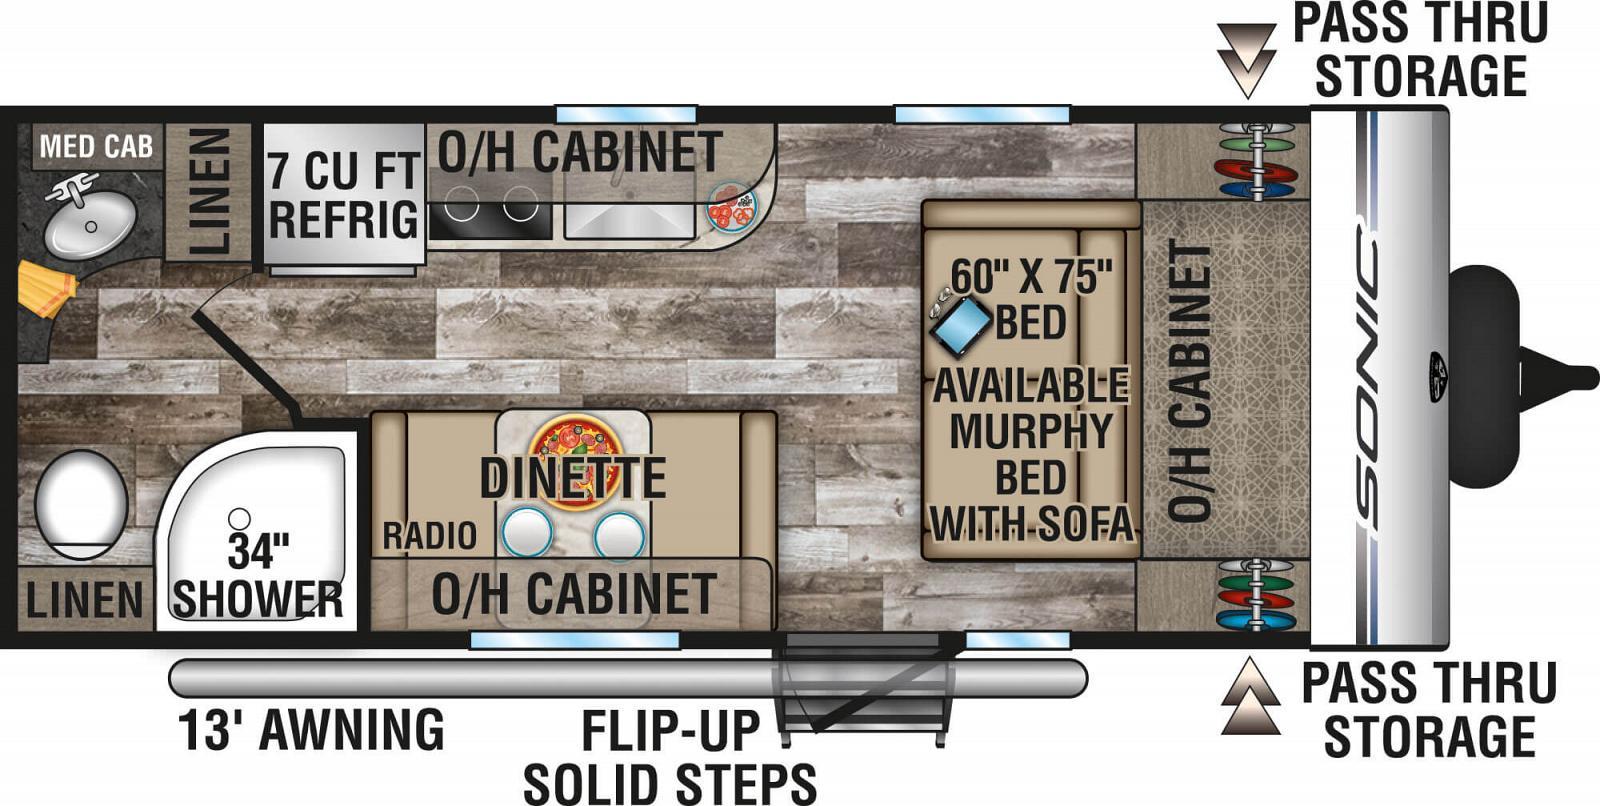 2020 VENTURE SONIC 190VRB Floorplan